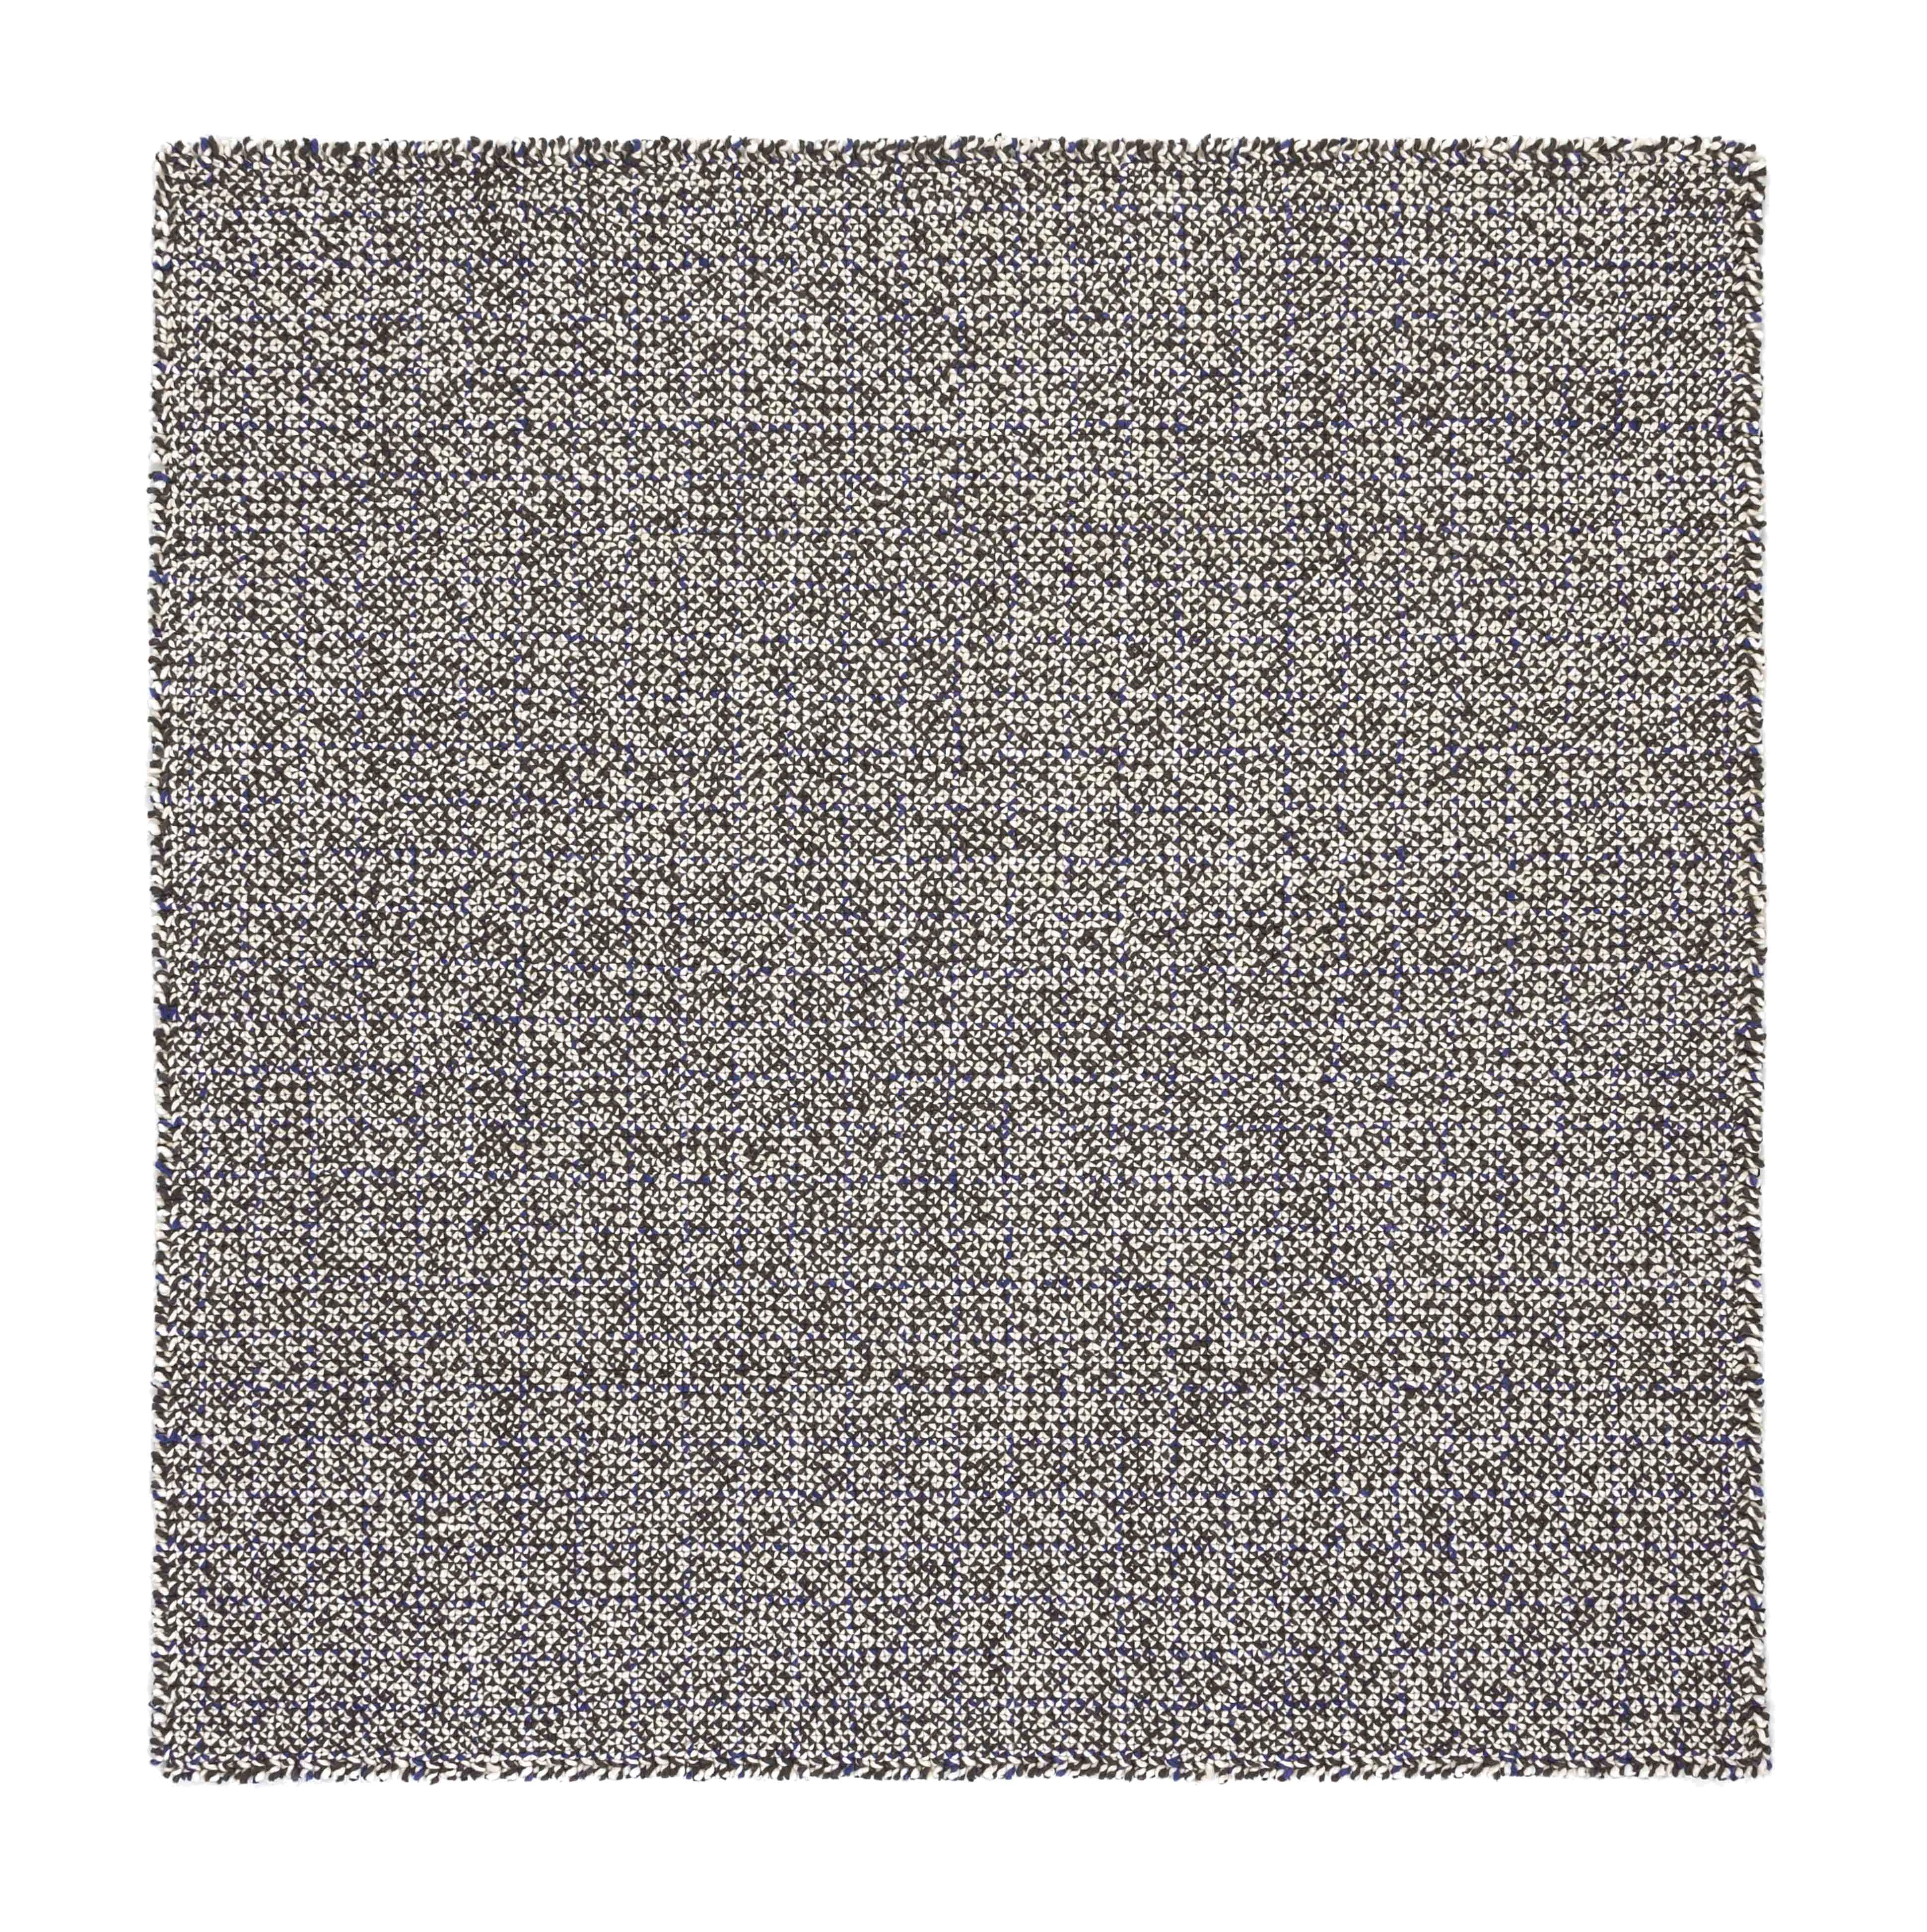 Decoration - Rugs - Waan Rug - 170 x 240 cm - Wool by Gan - Blue - Wool